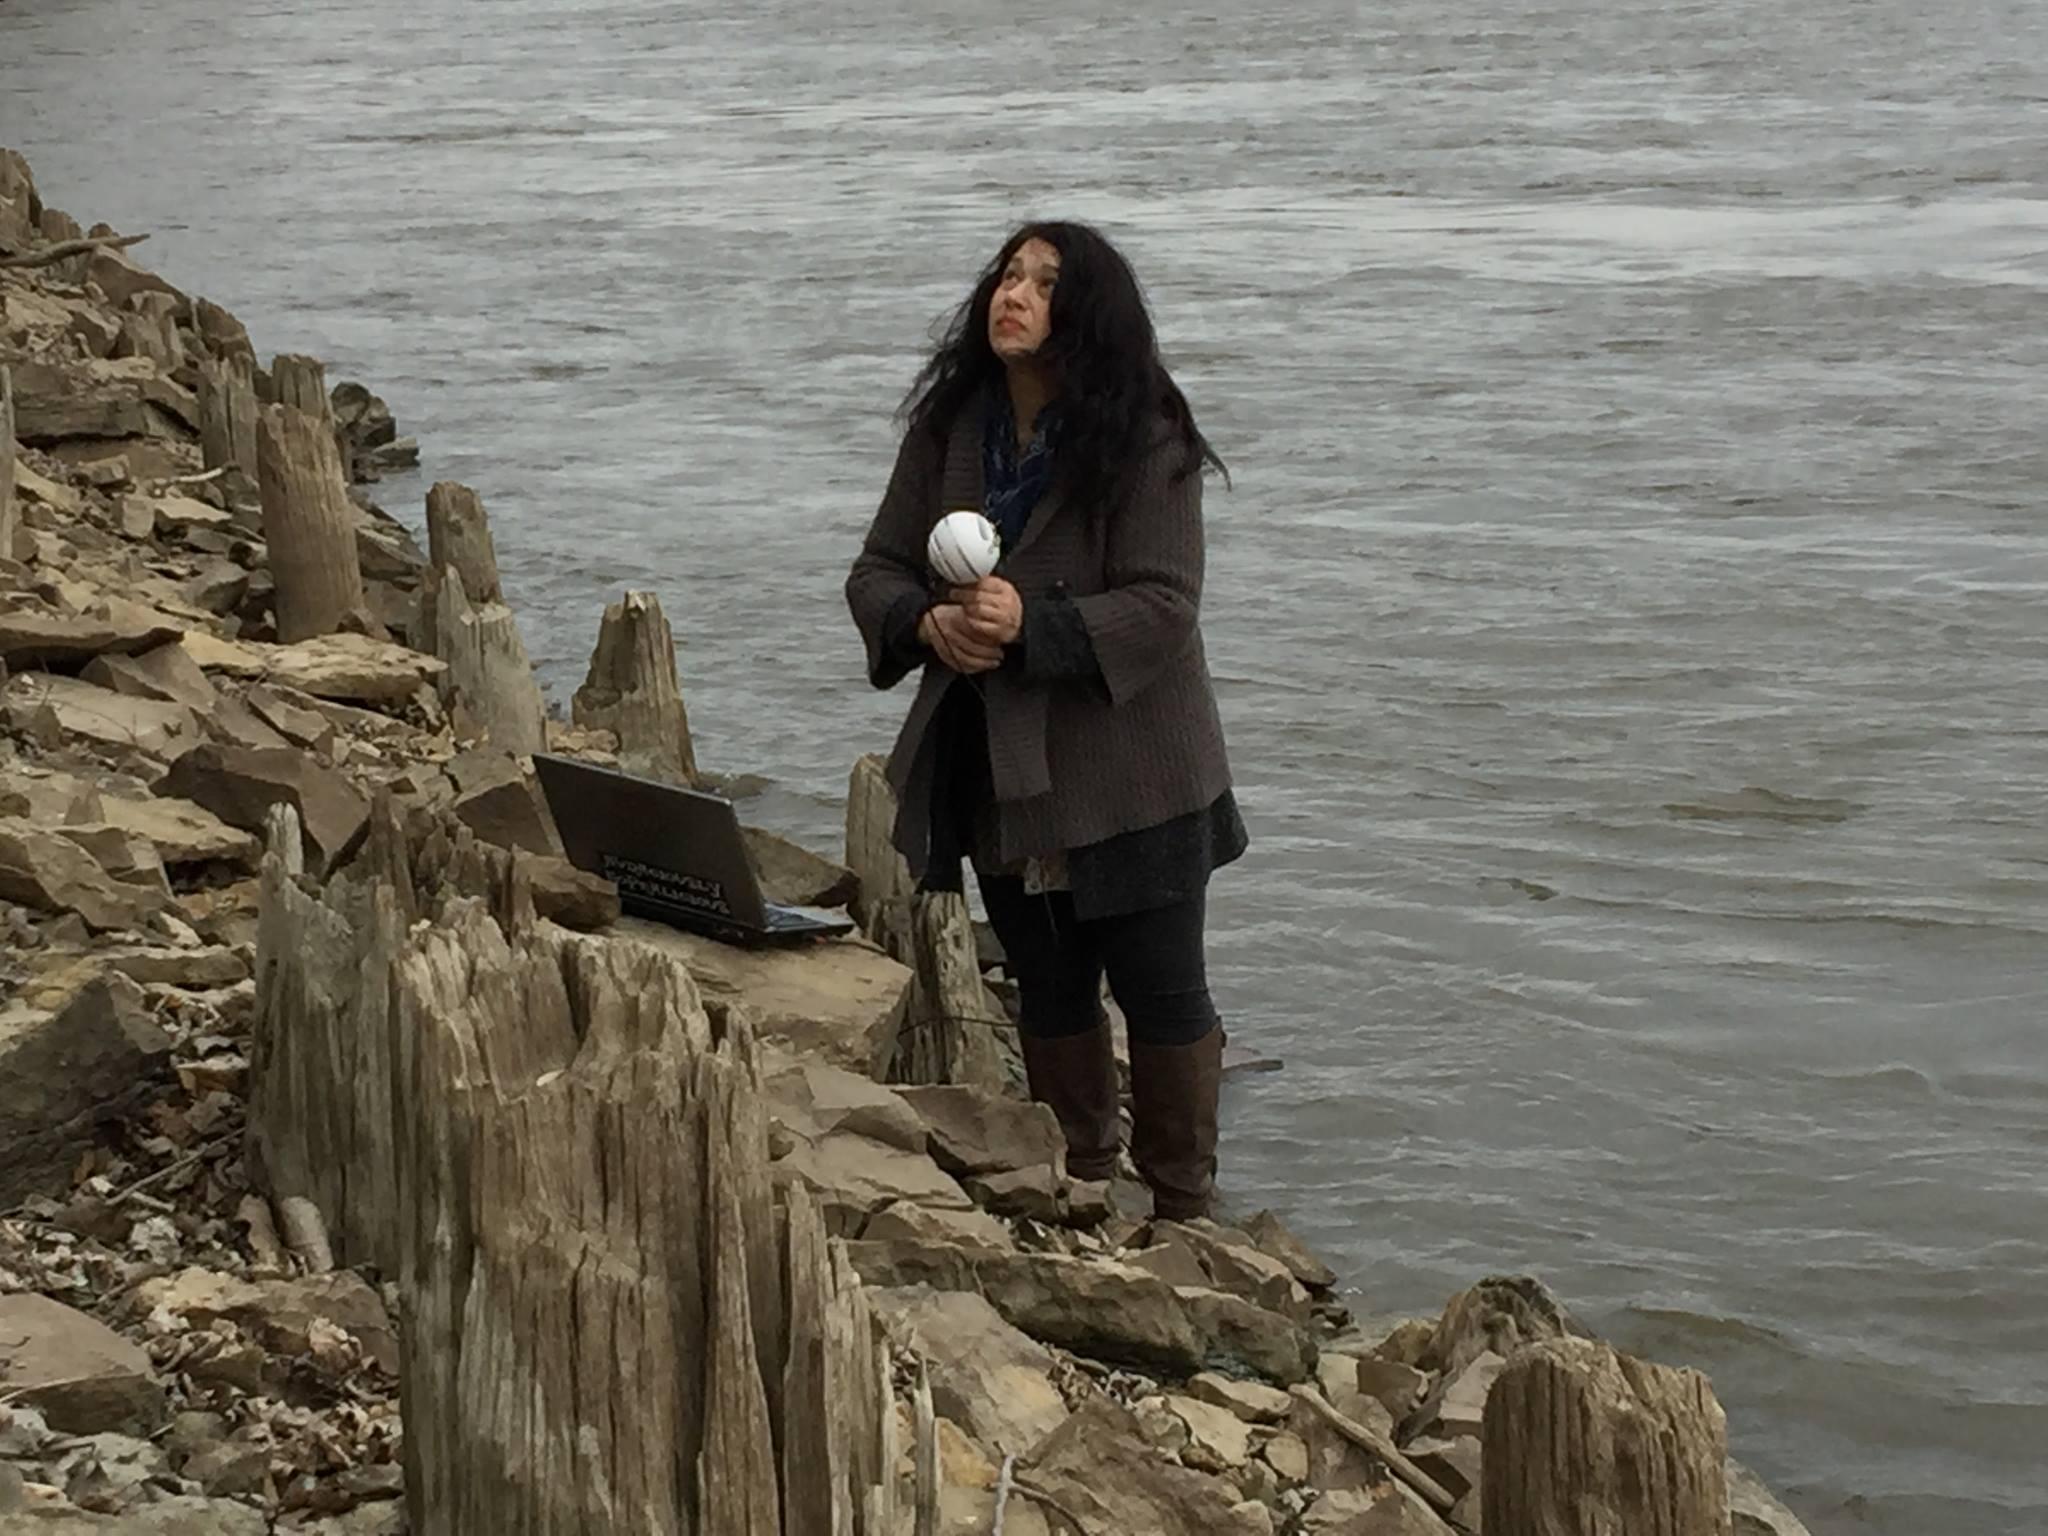 Weaving the River, Jen Apell